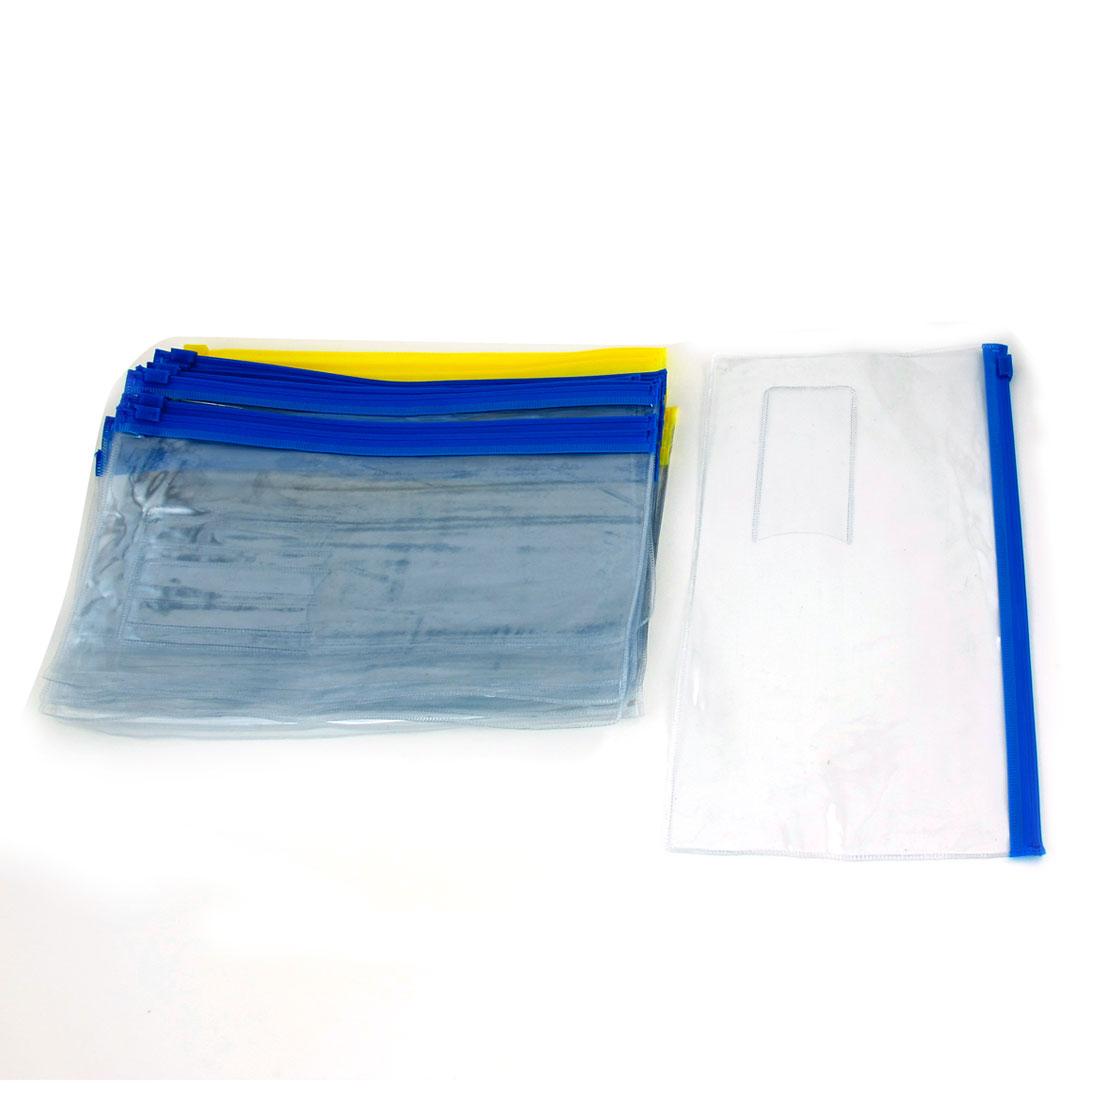 30 Pcs B6 Paper Zipper Closure Bag Pocket Pen Files Folders Yellow Blue Clear